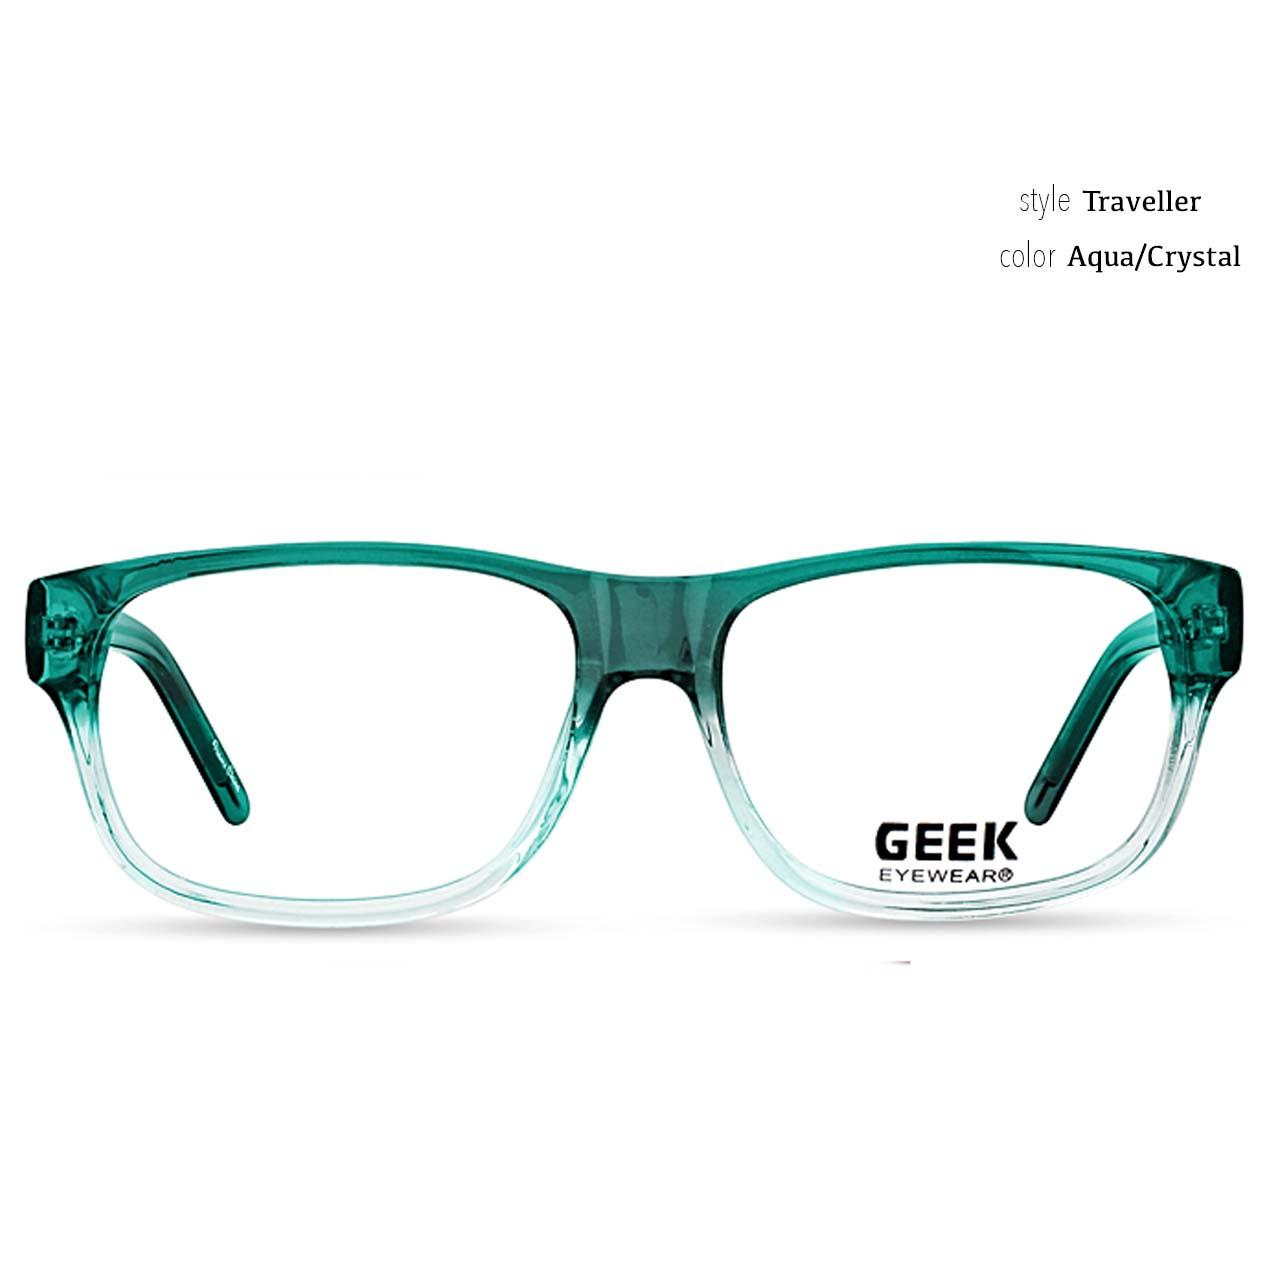 GEEK Eyewear Style Traveller Aqua